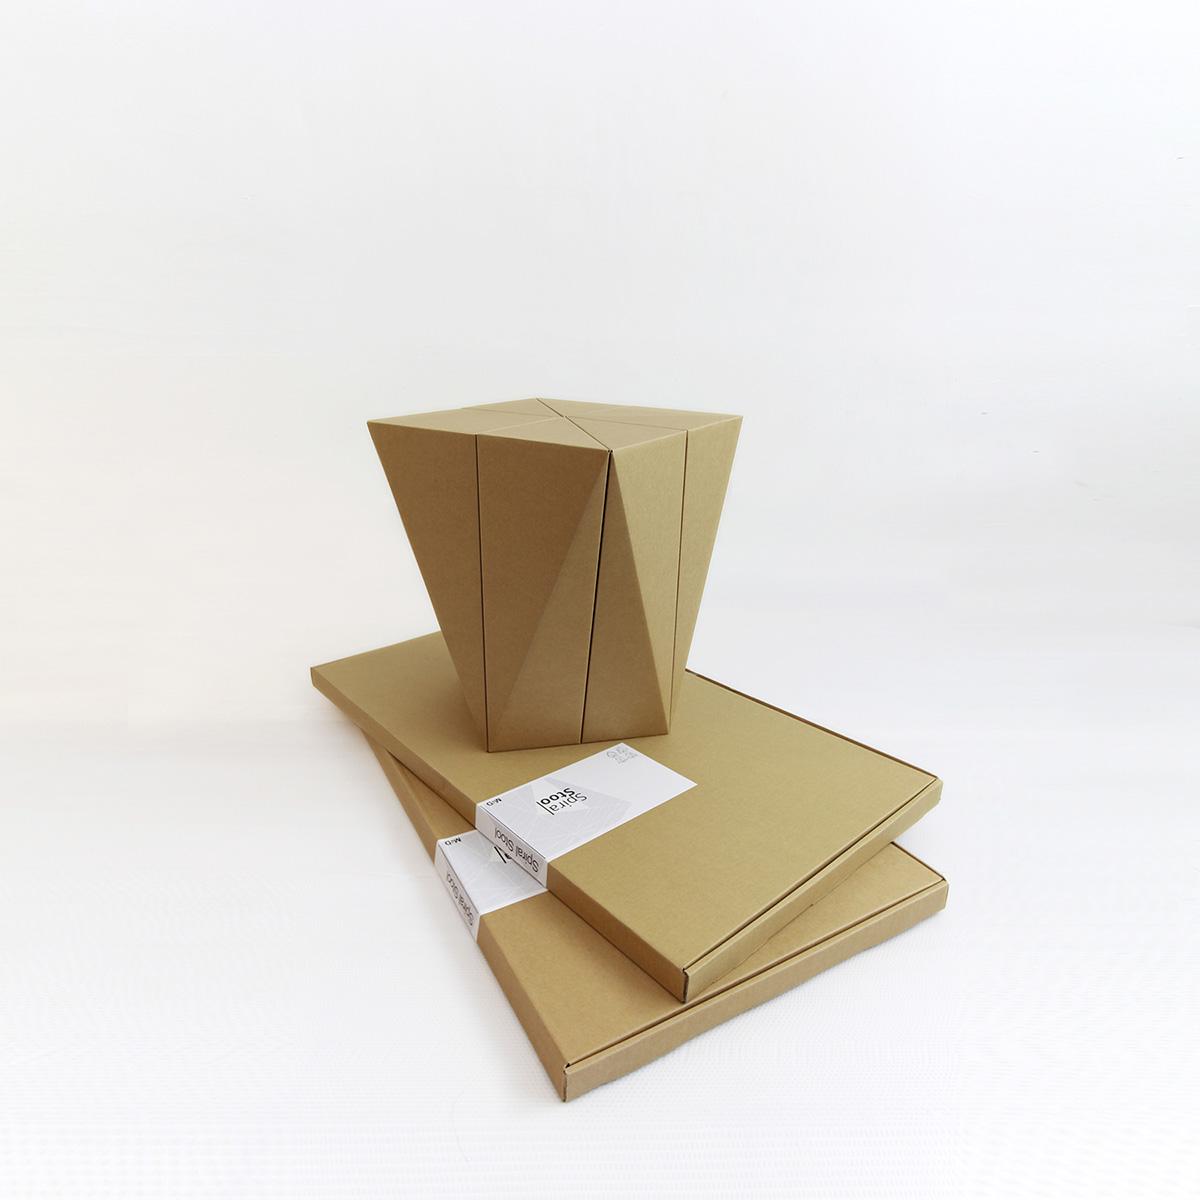 04-spiral-stool-misosoupdesign